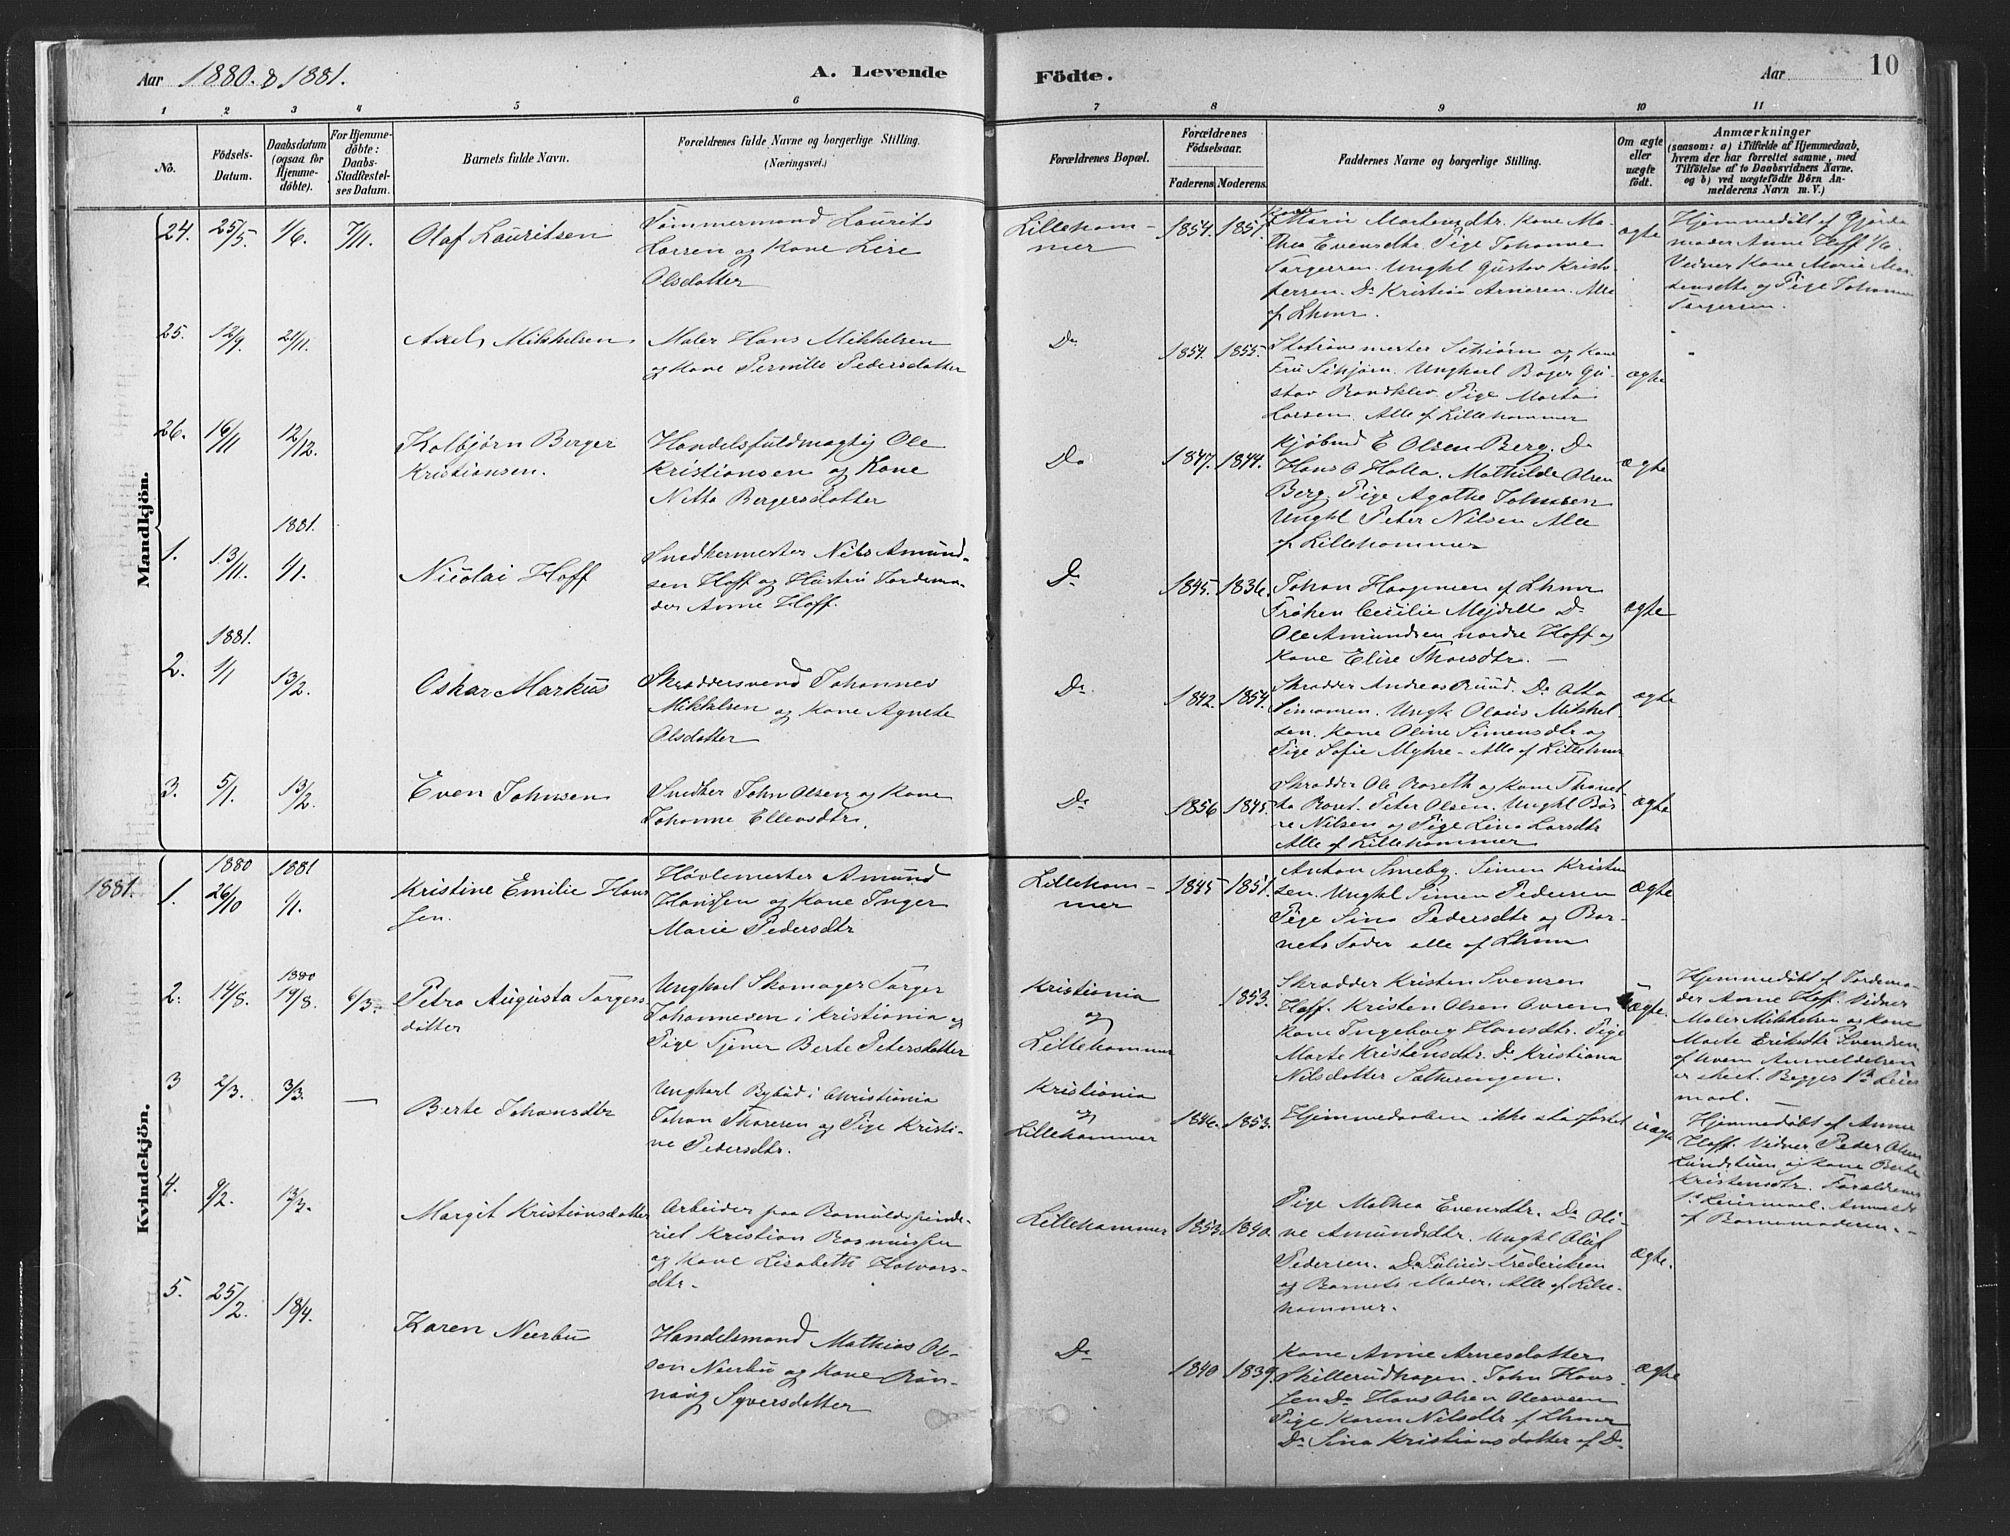 SAH, Fåberg prestekontor, Ministerialbok nr. 10, 1879-1900, s. 10